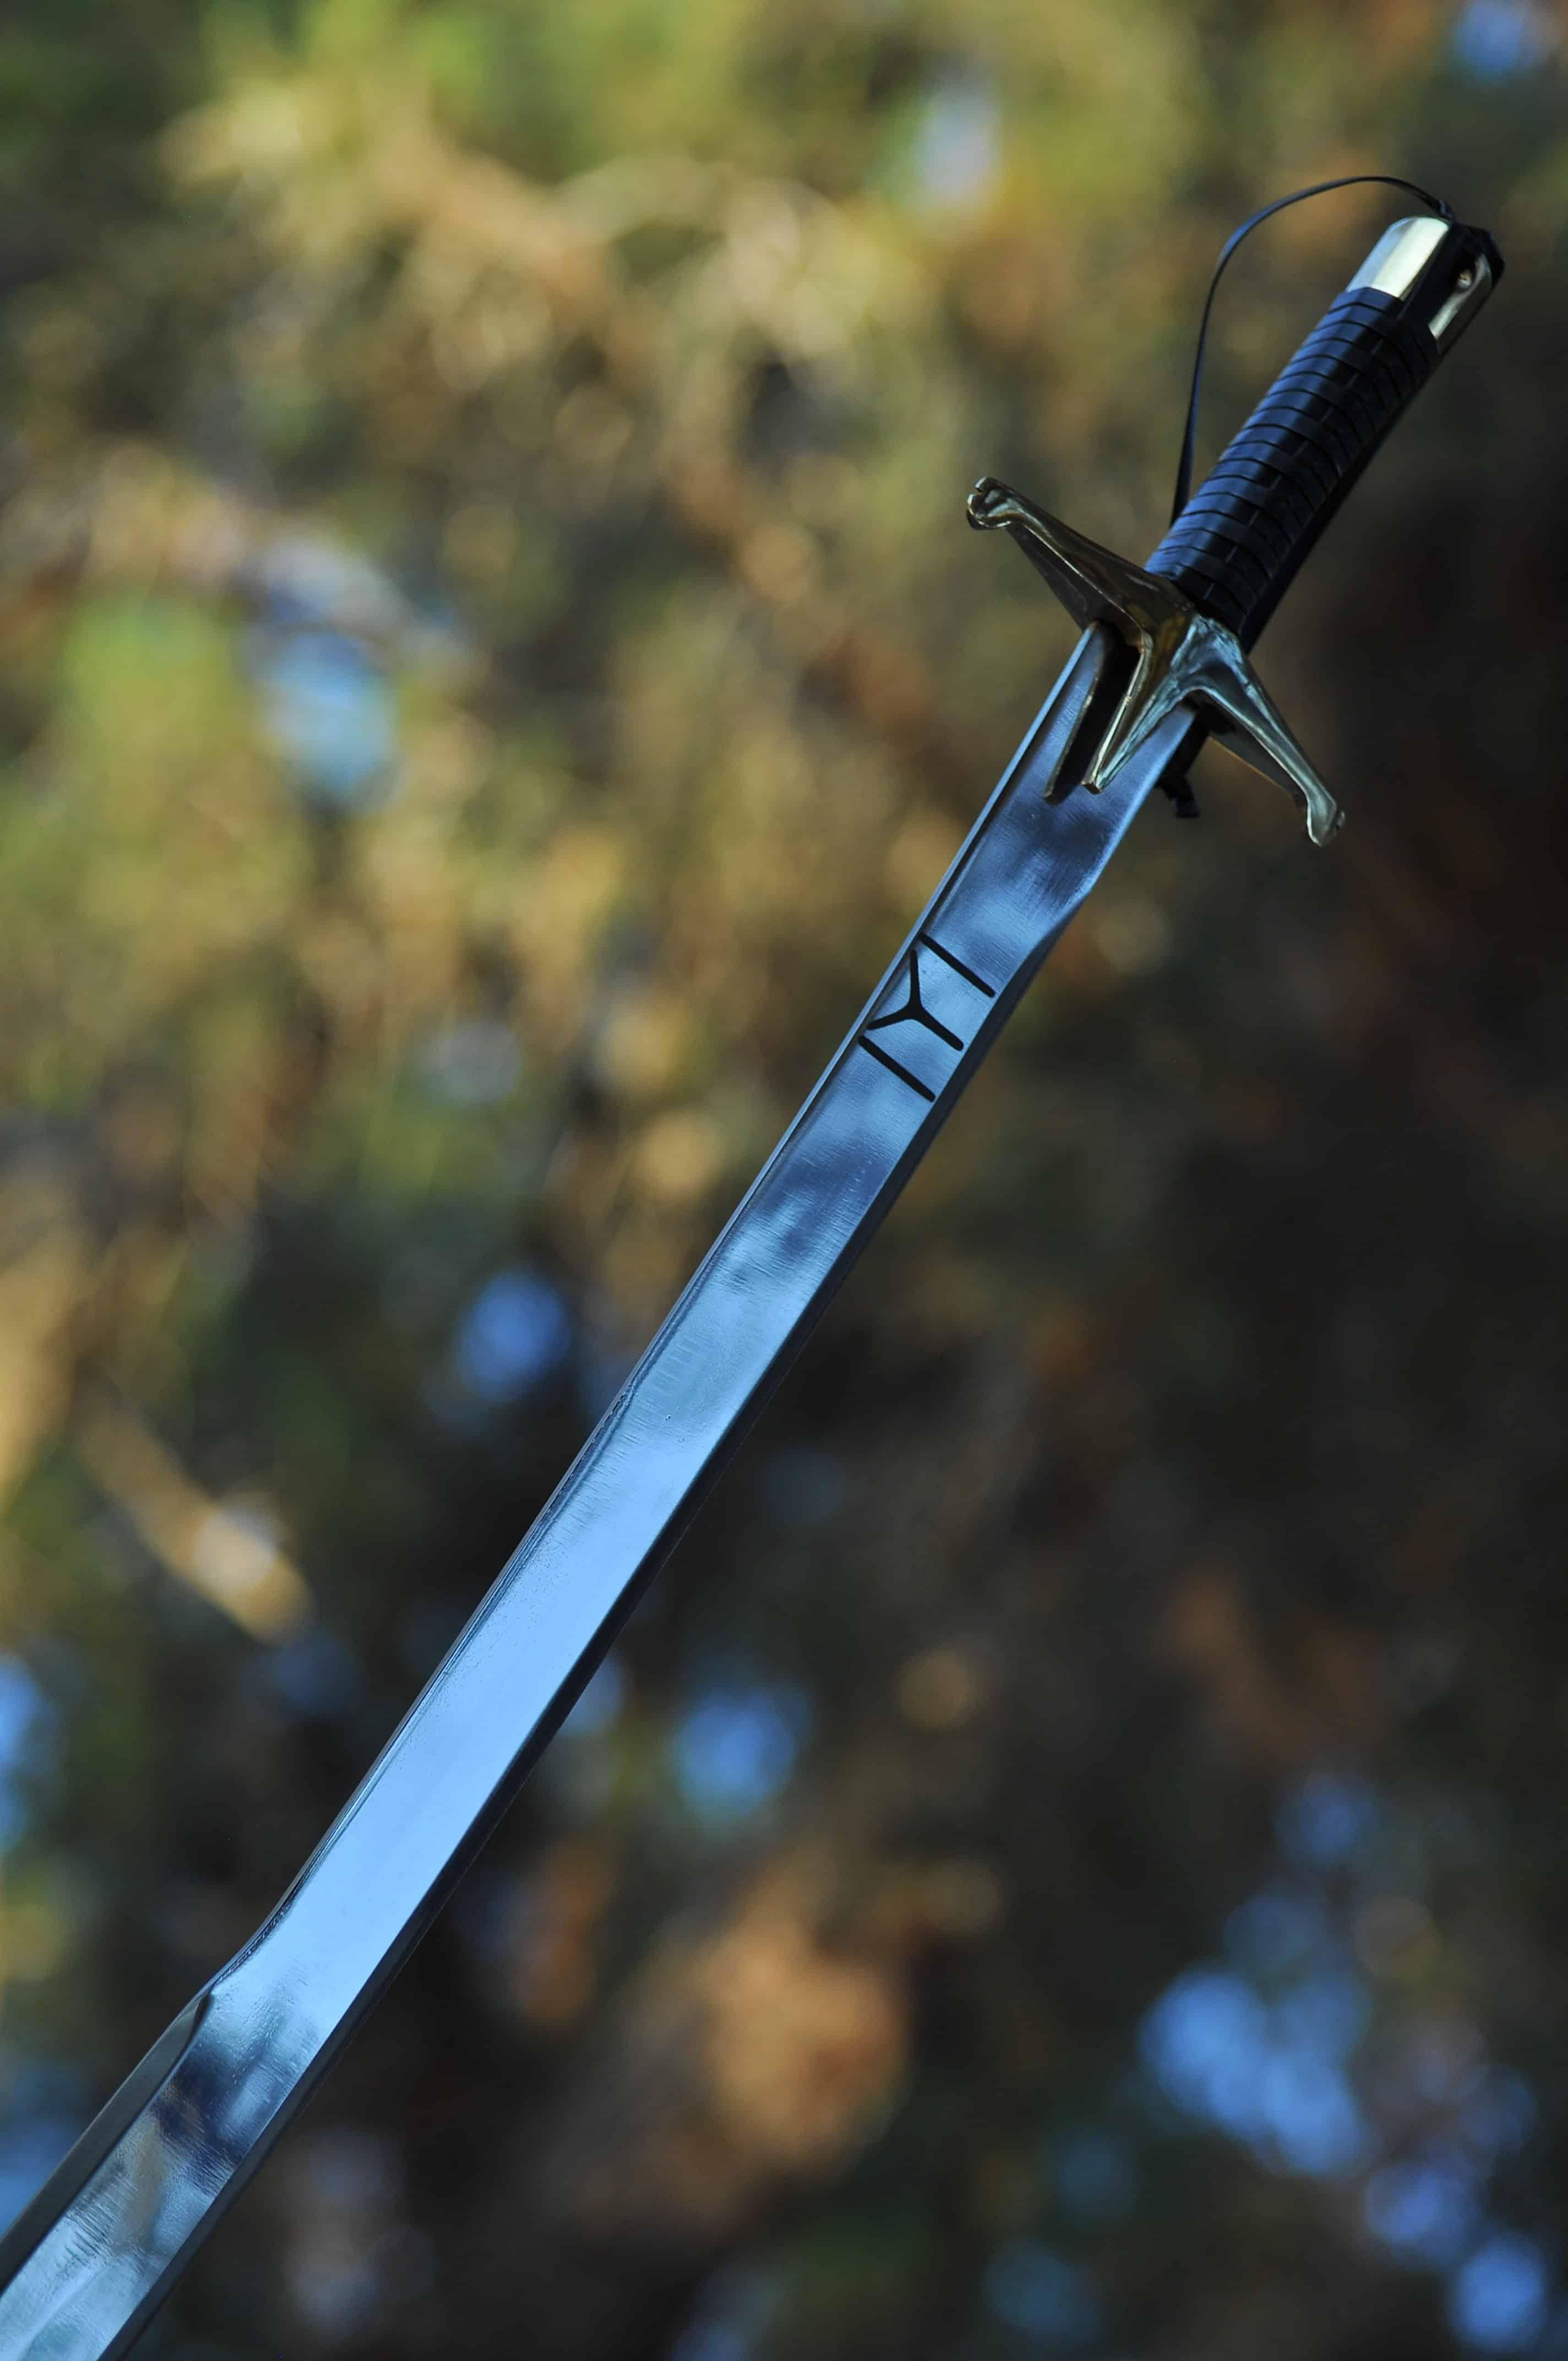 Dirilis Ertugrul Sword Ottoman Swords For Sale Free